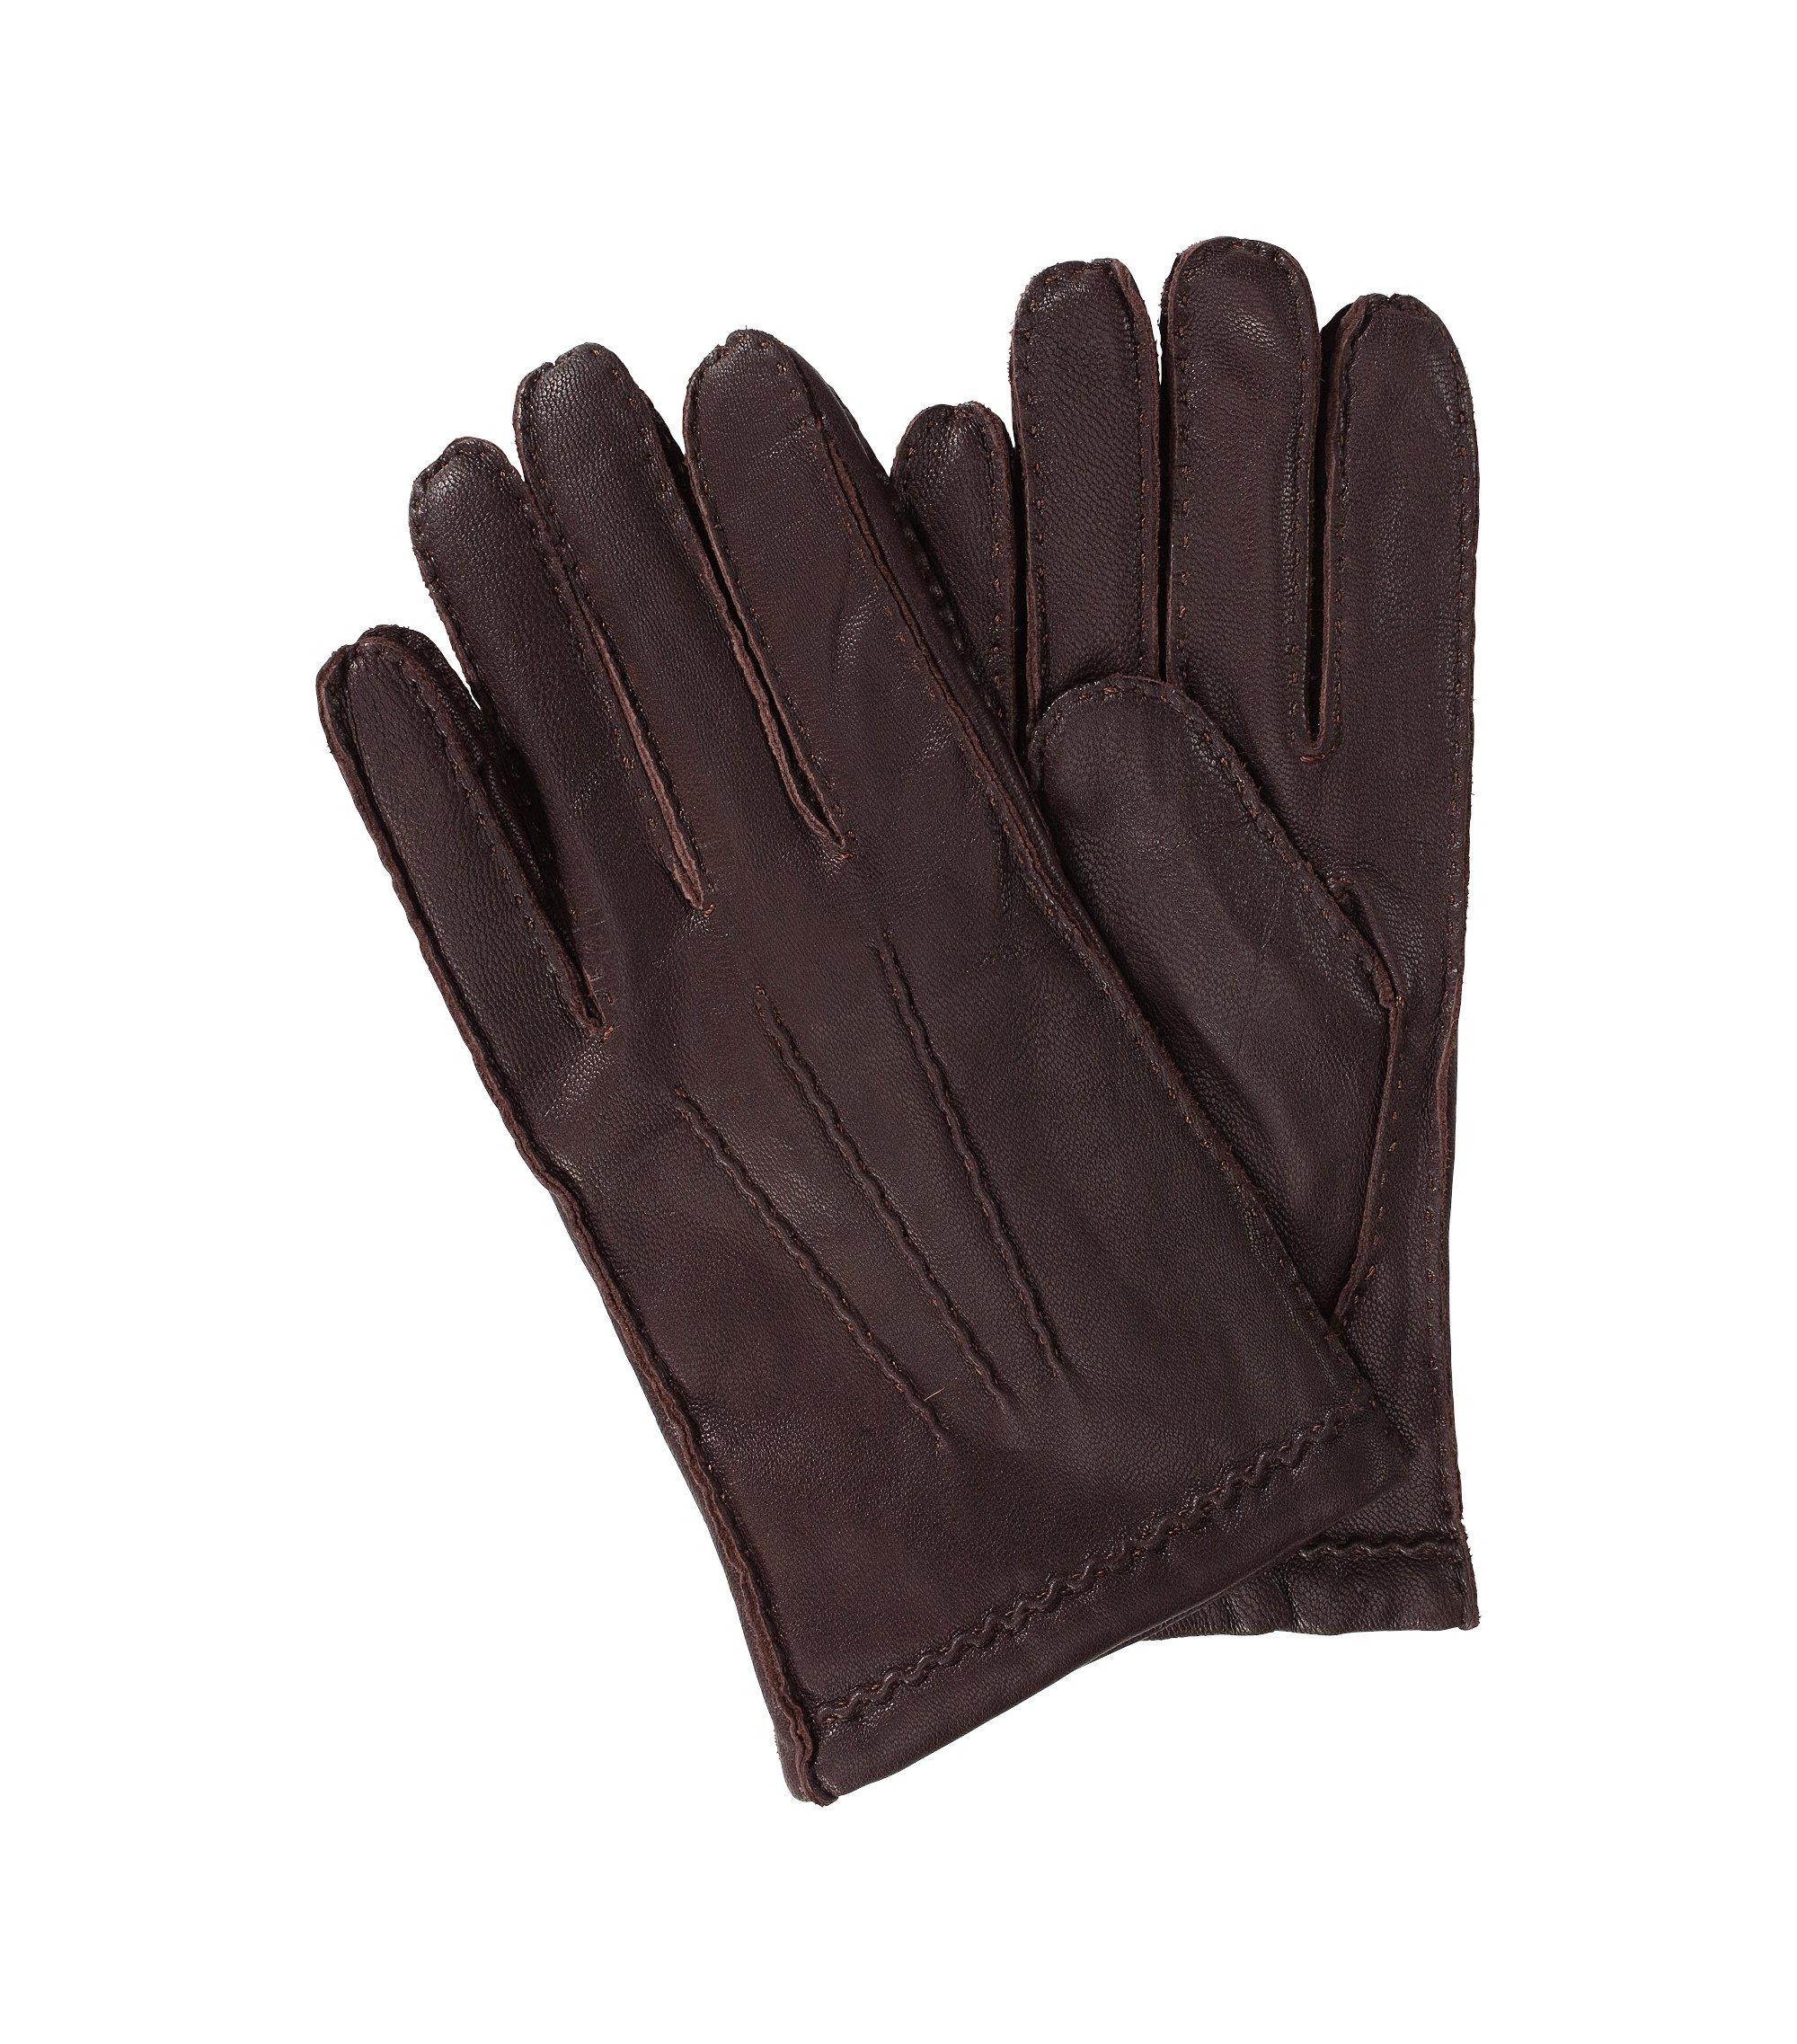 Soft kid leather glove 'Kantoz', Open brown